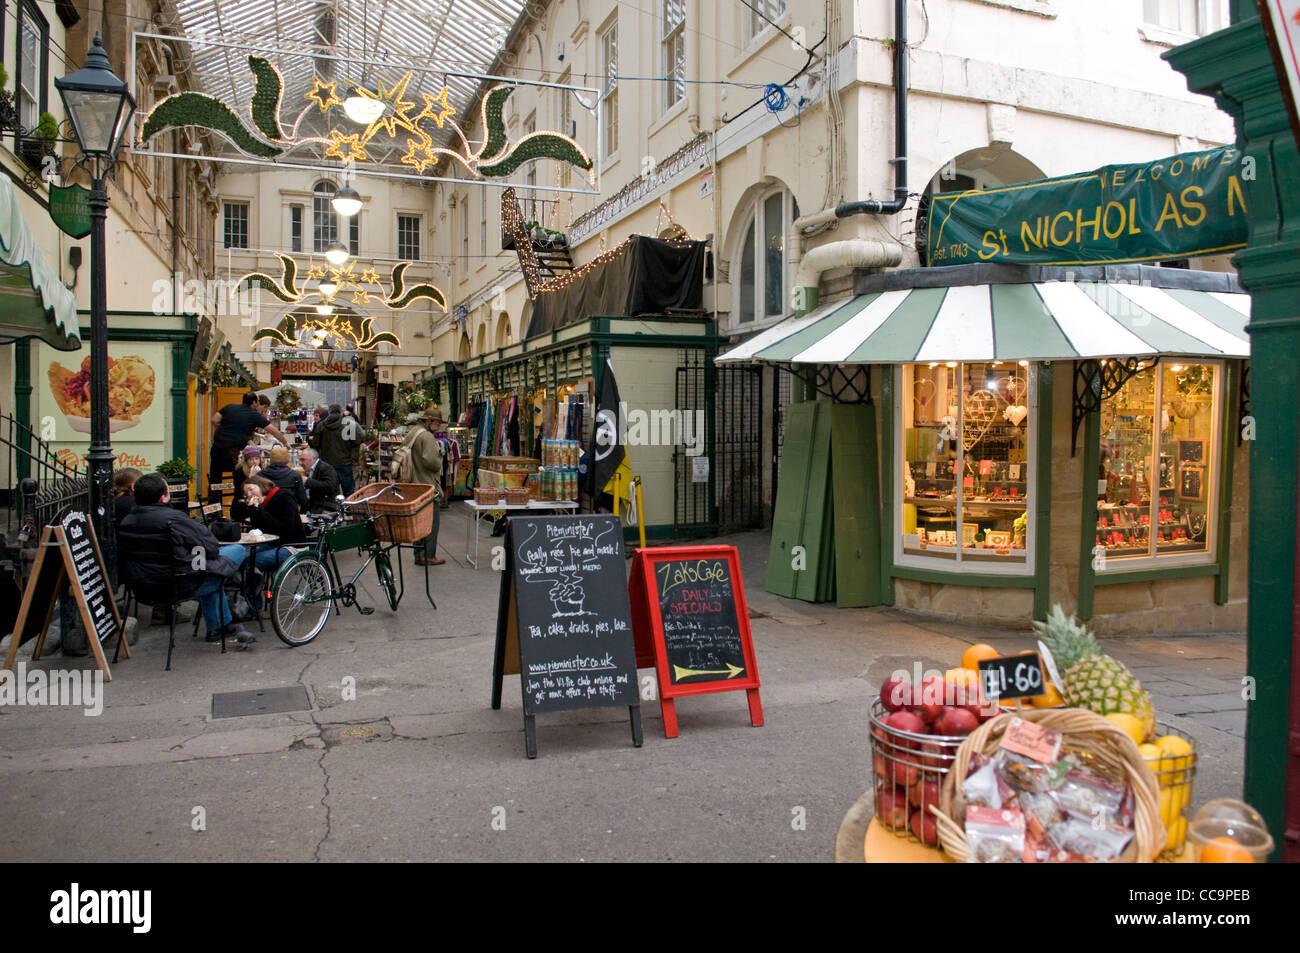 St. Nicholas Images >> St Nicholas Market ,Bristol, UK Stock Photo: 42011827 - Alamy